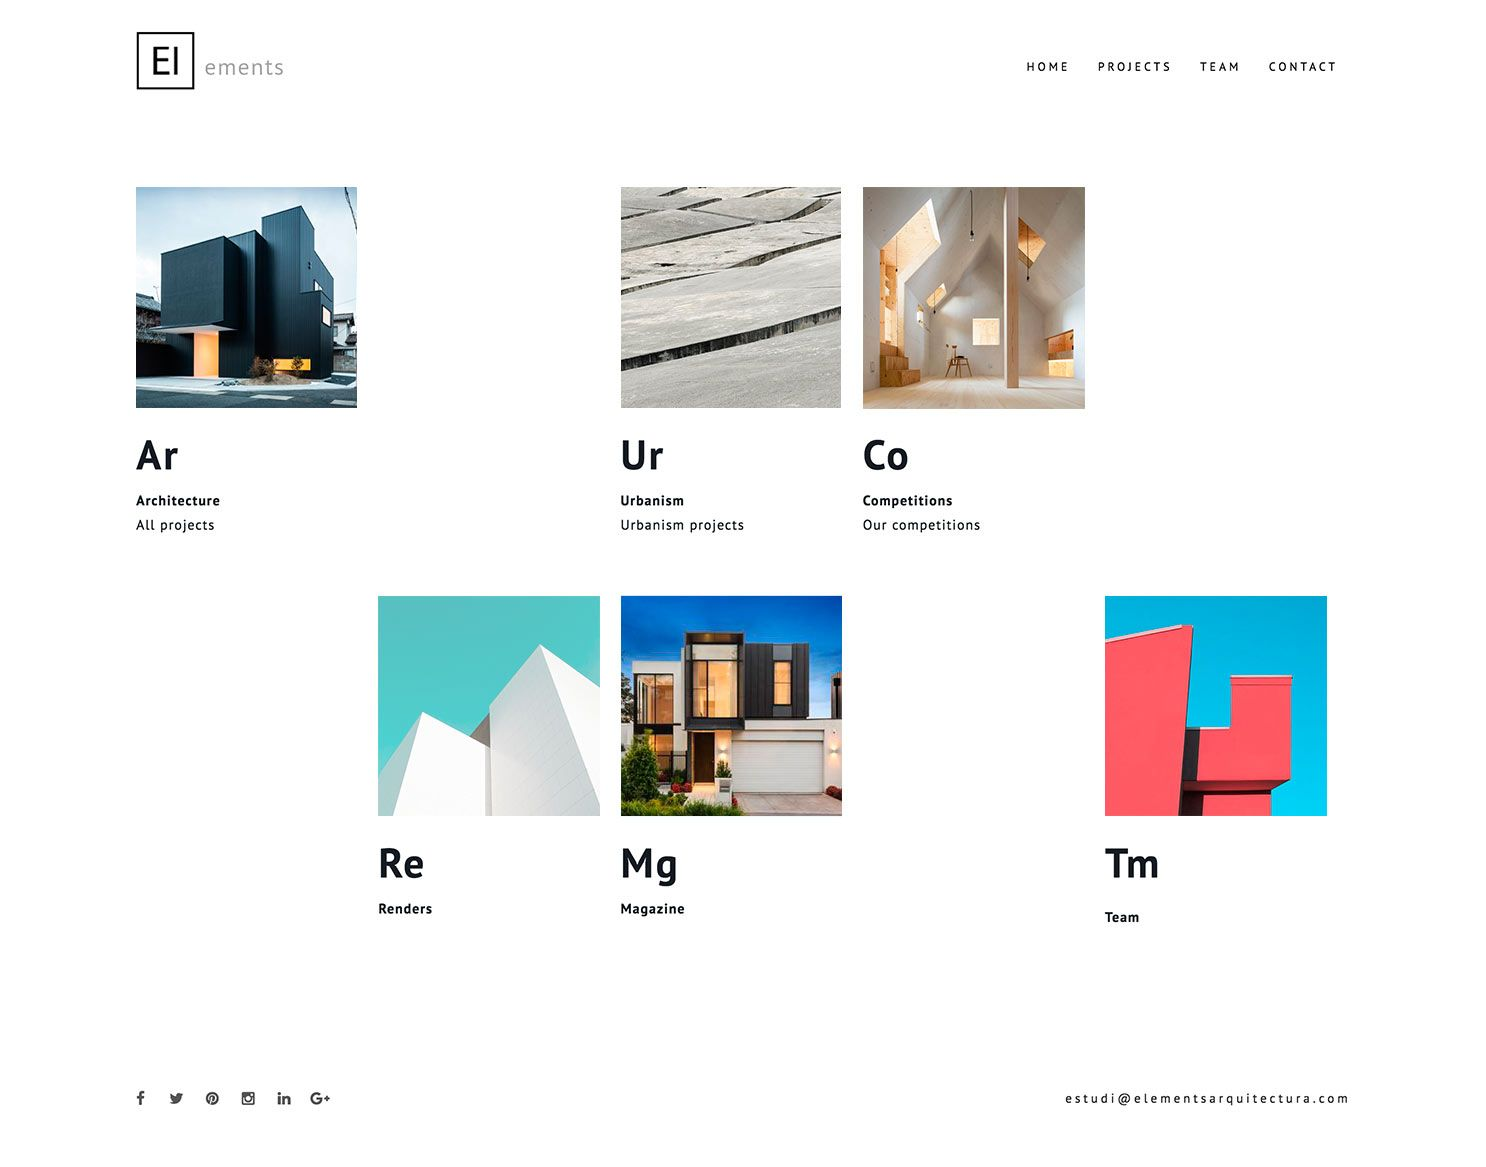 elements arquitectura